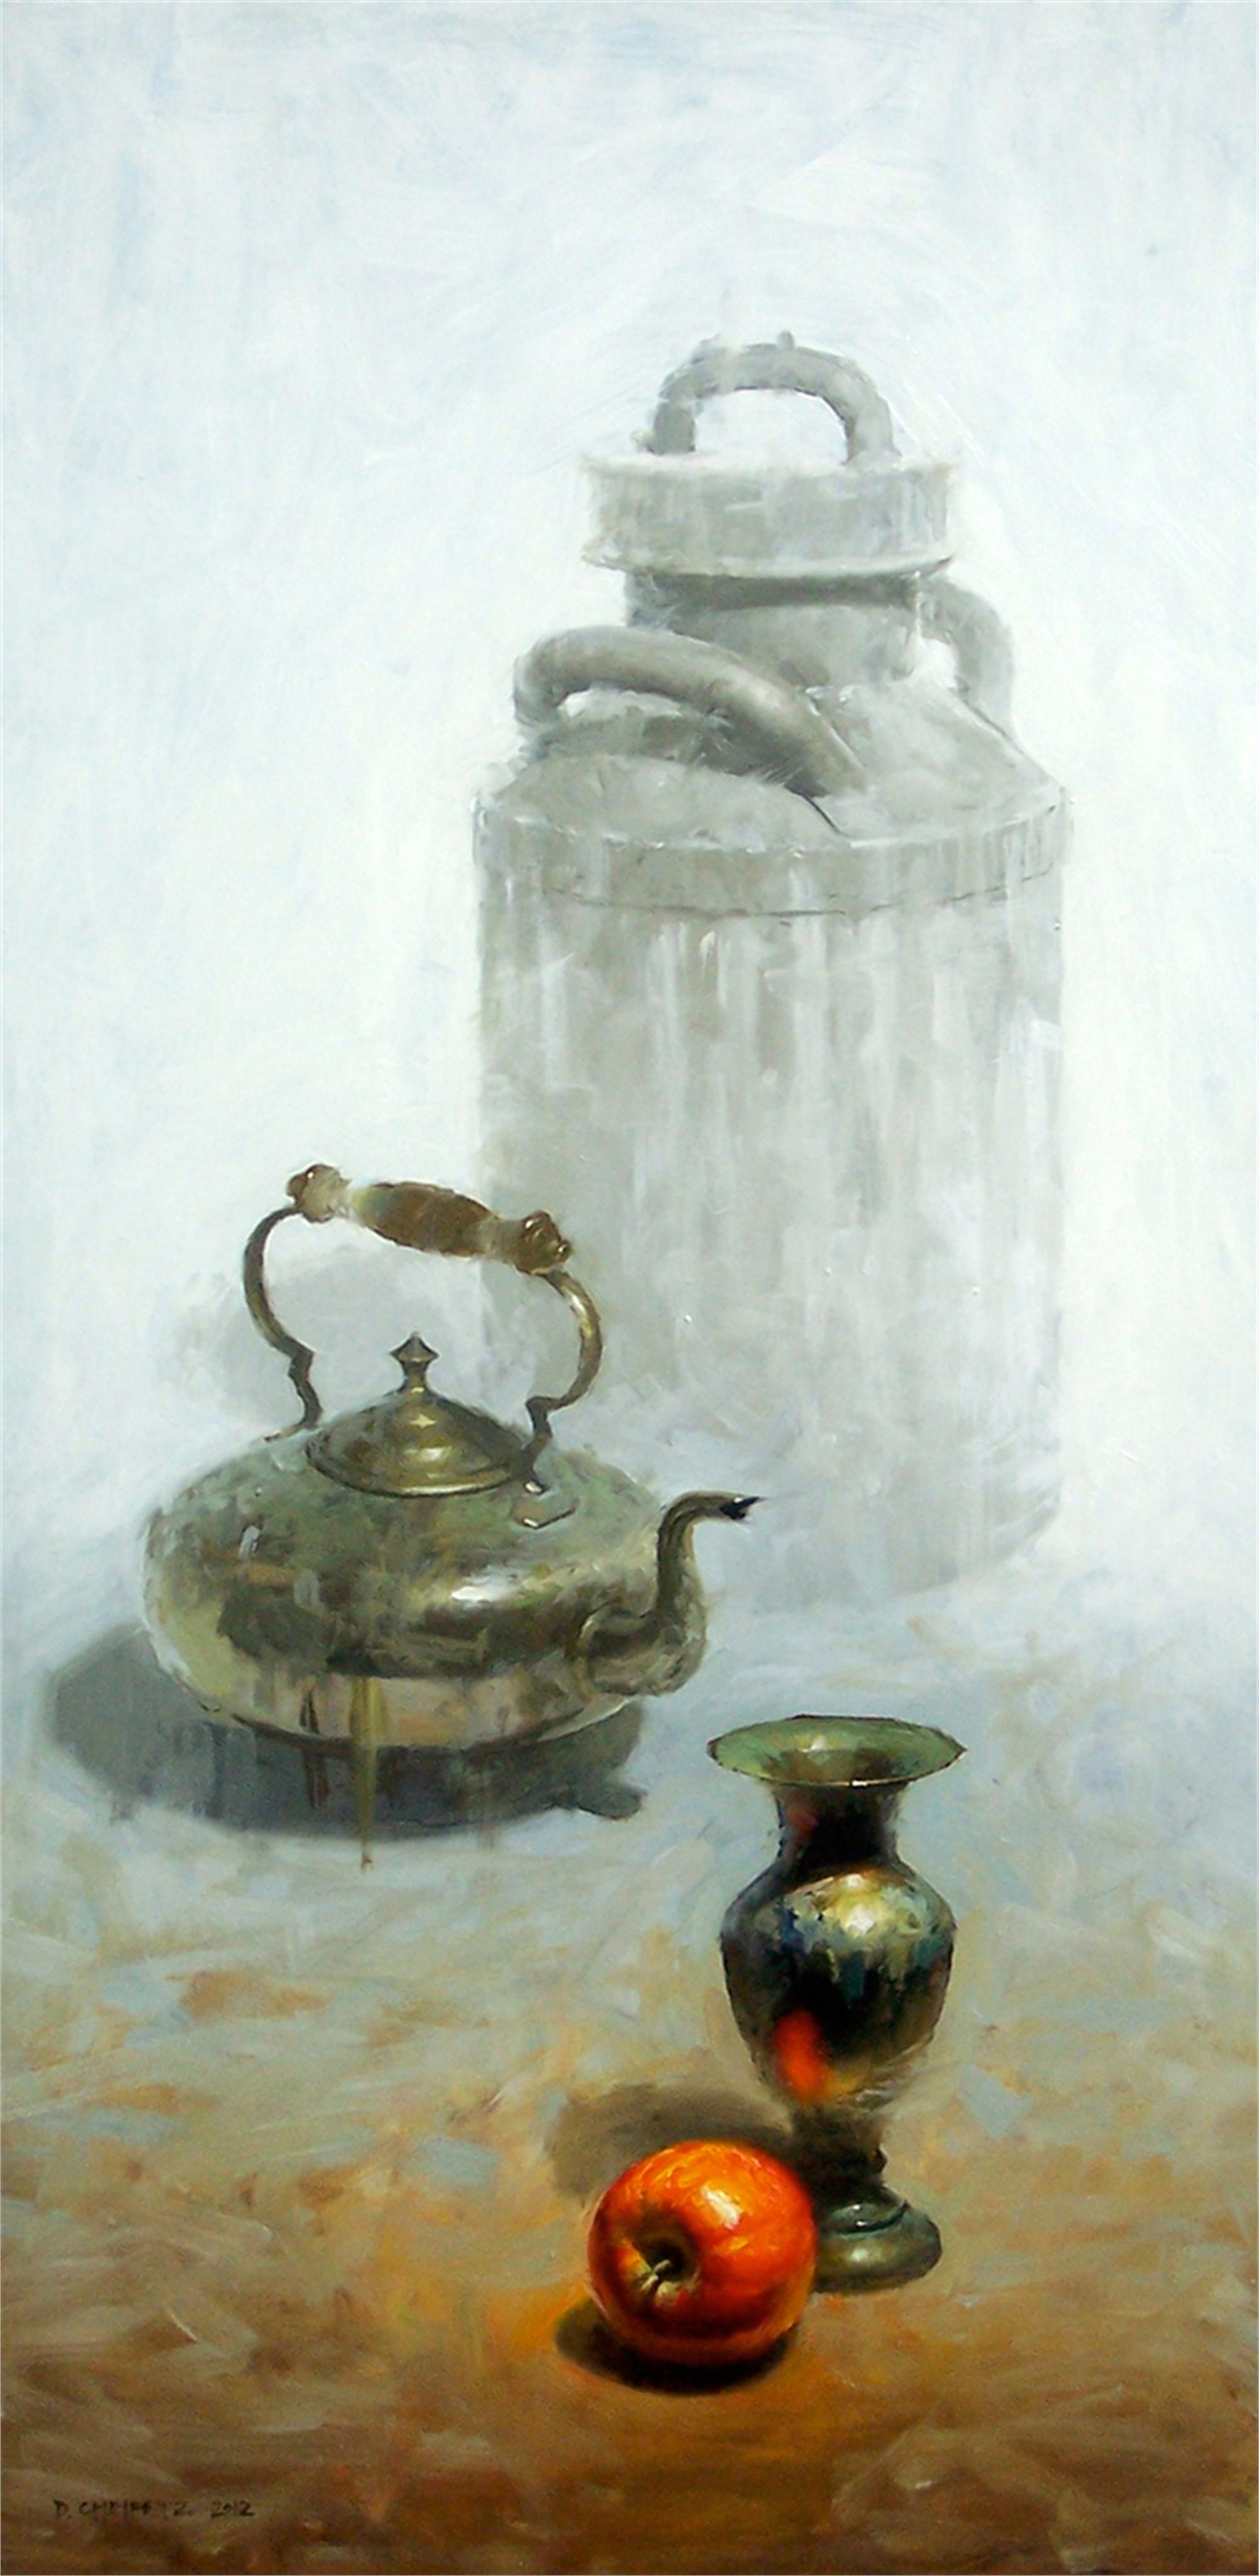 Relics by David Cheifetz